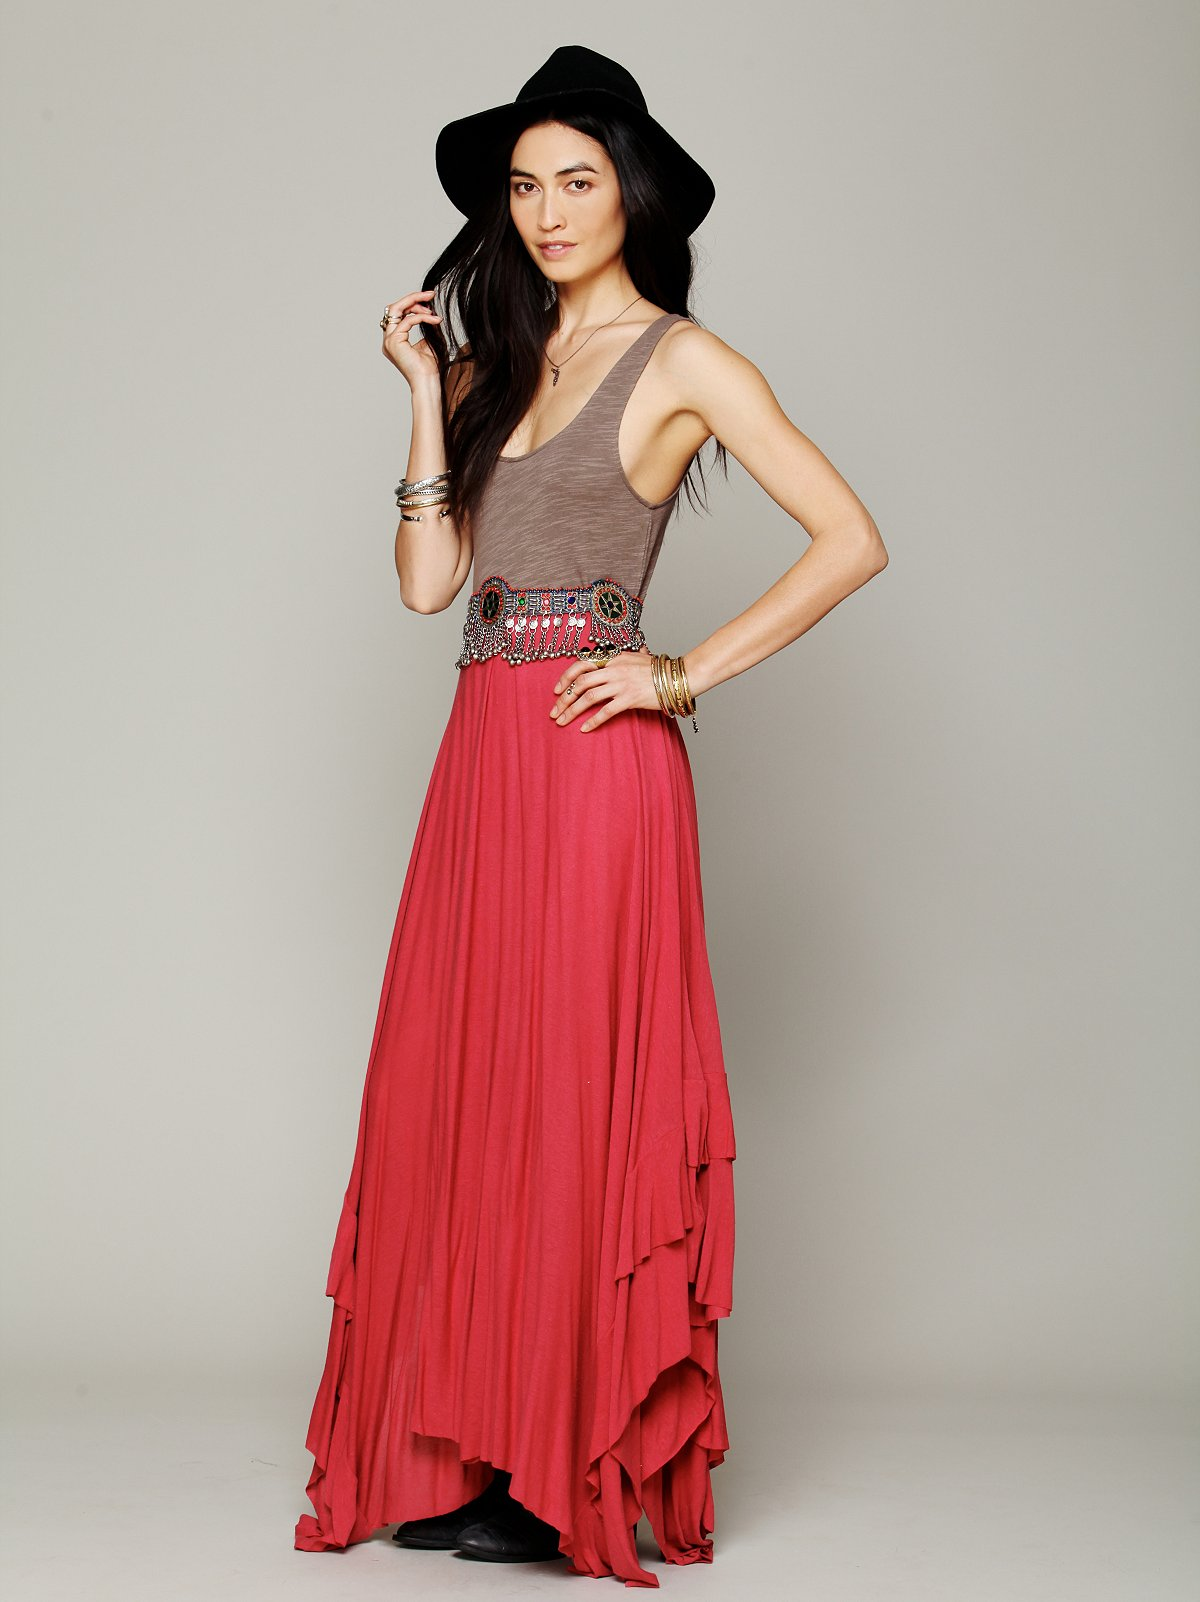 Princess of the Universe Dress